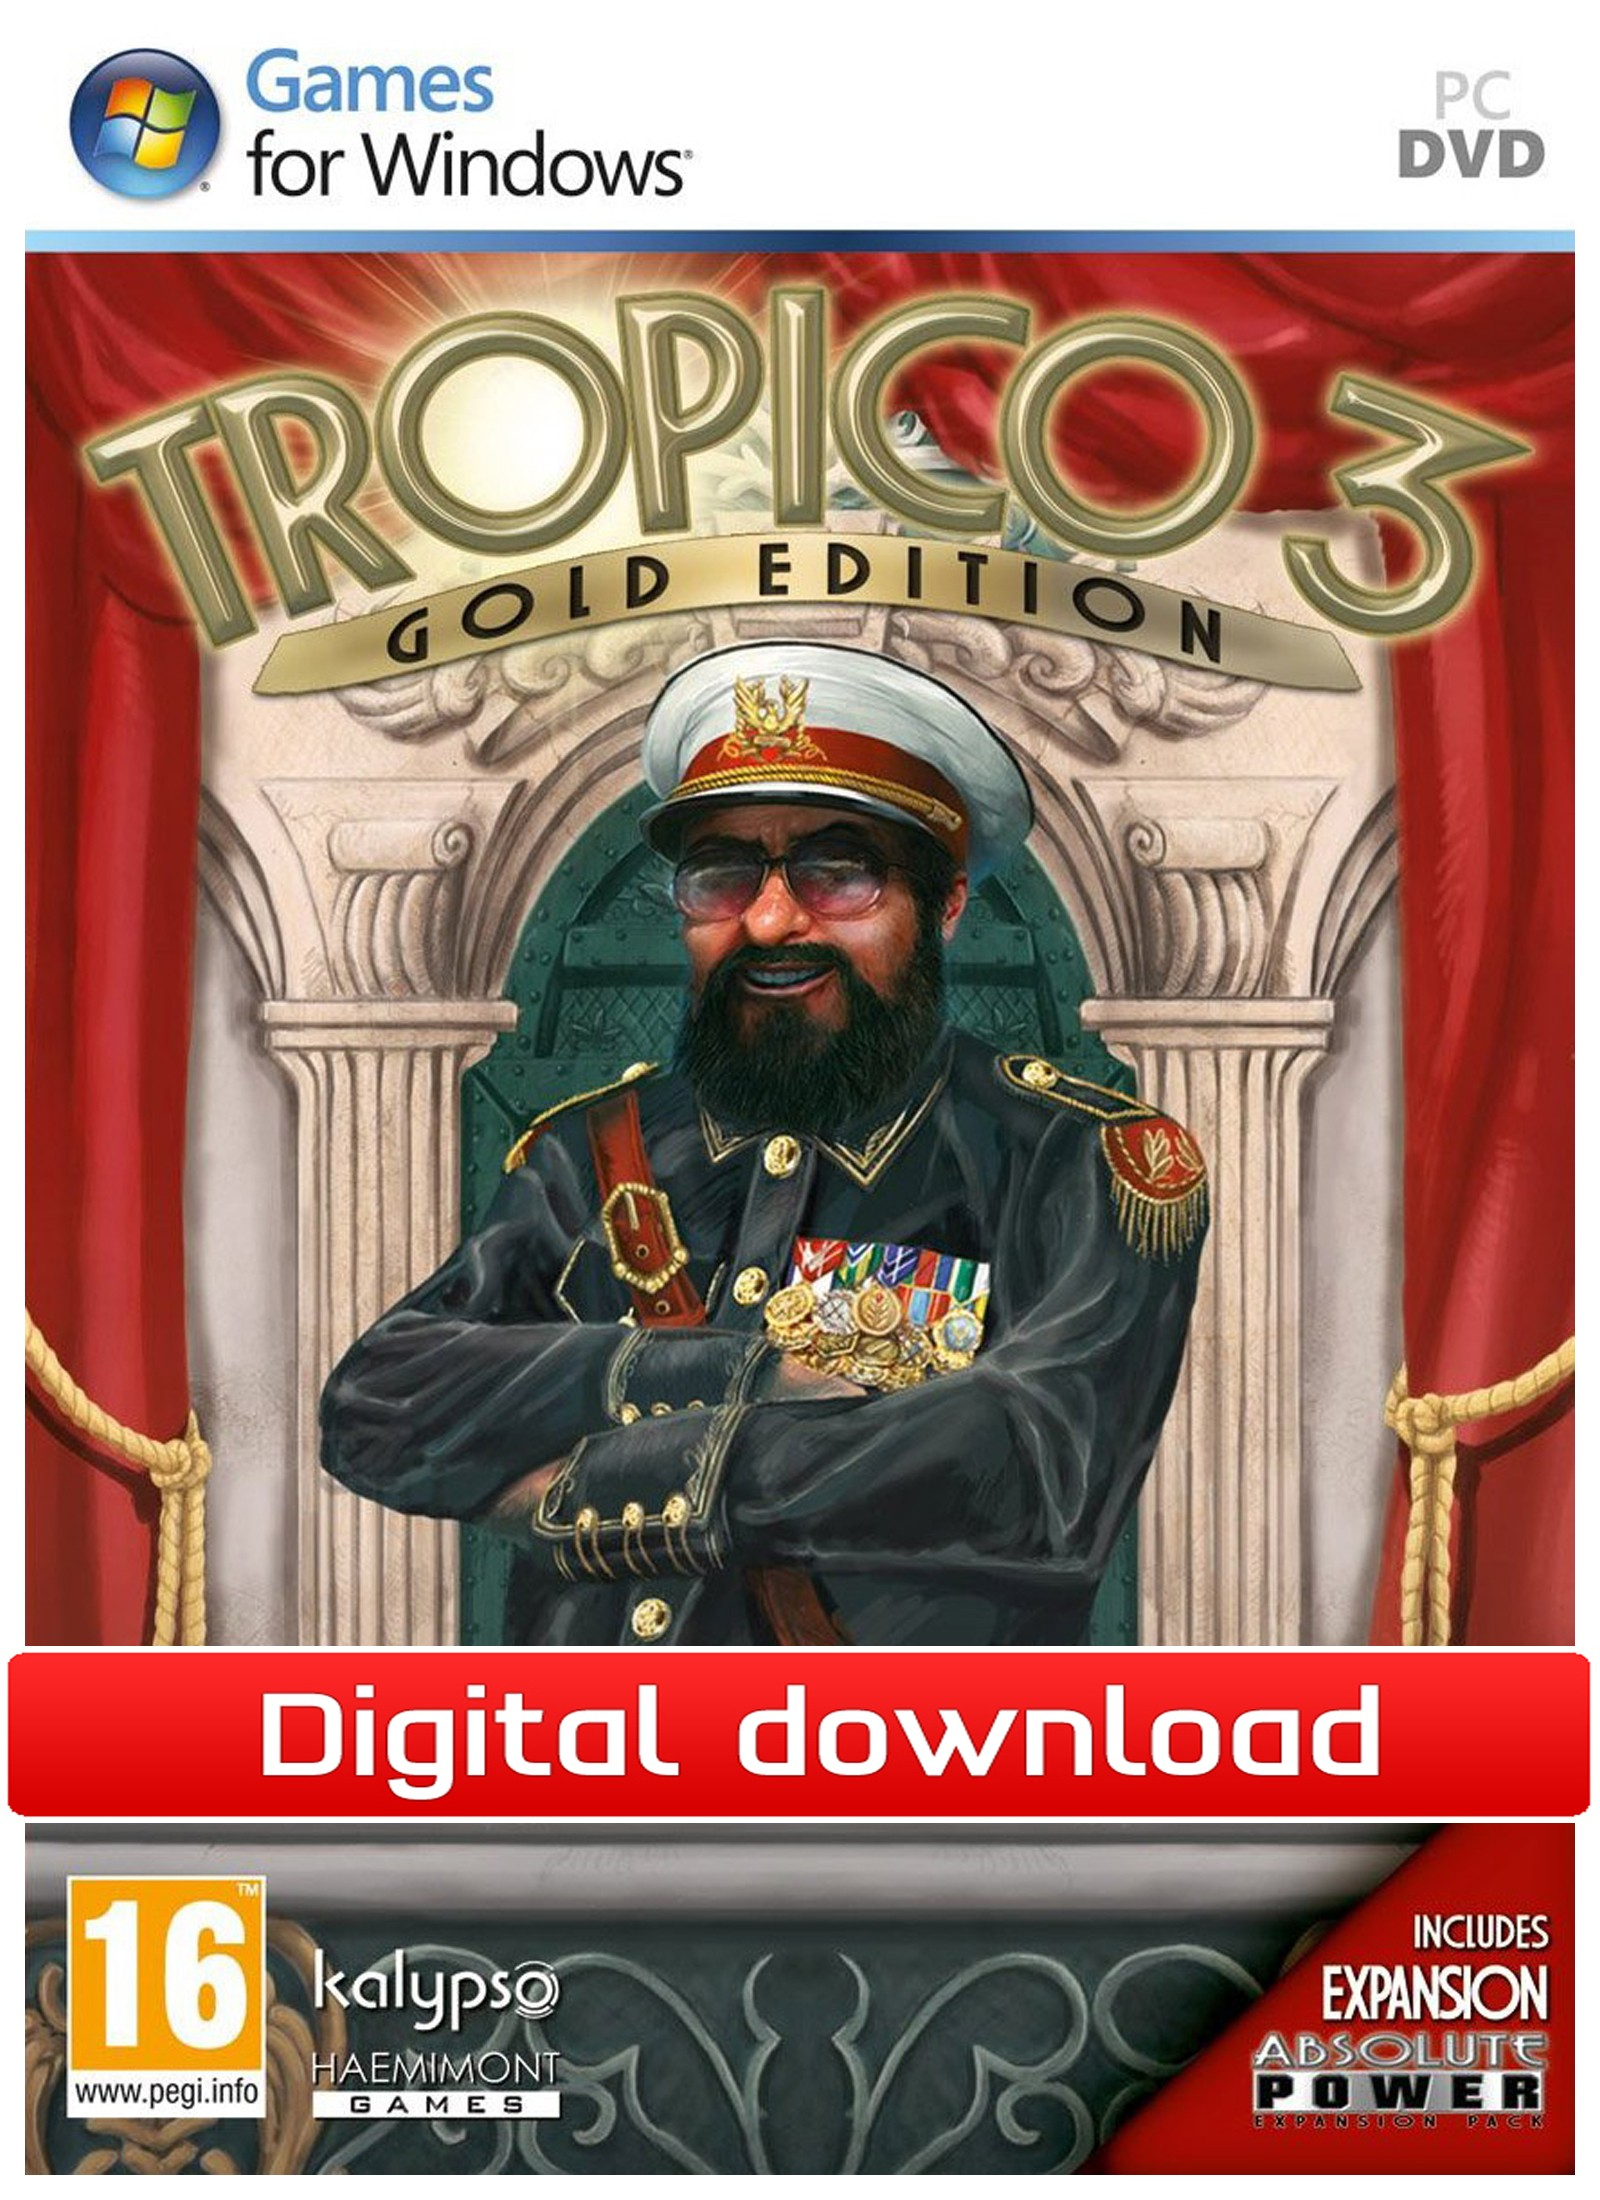 Tropico 3: Gold Edition (PC nedlastning) PCDD24615